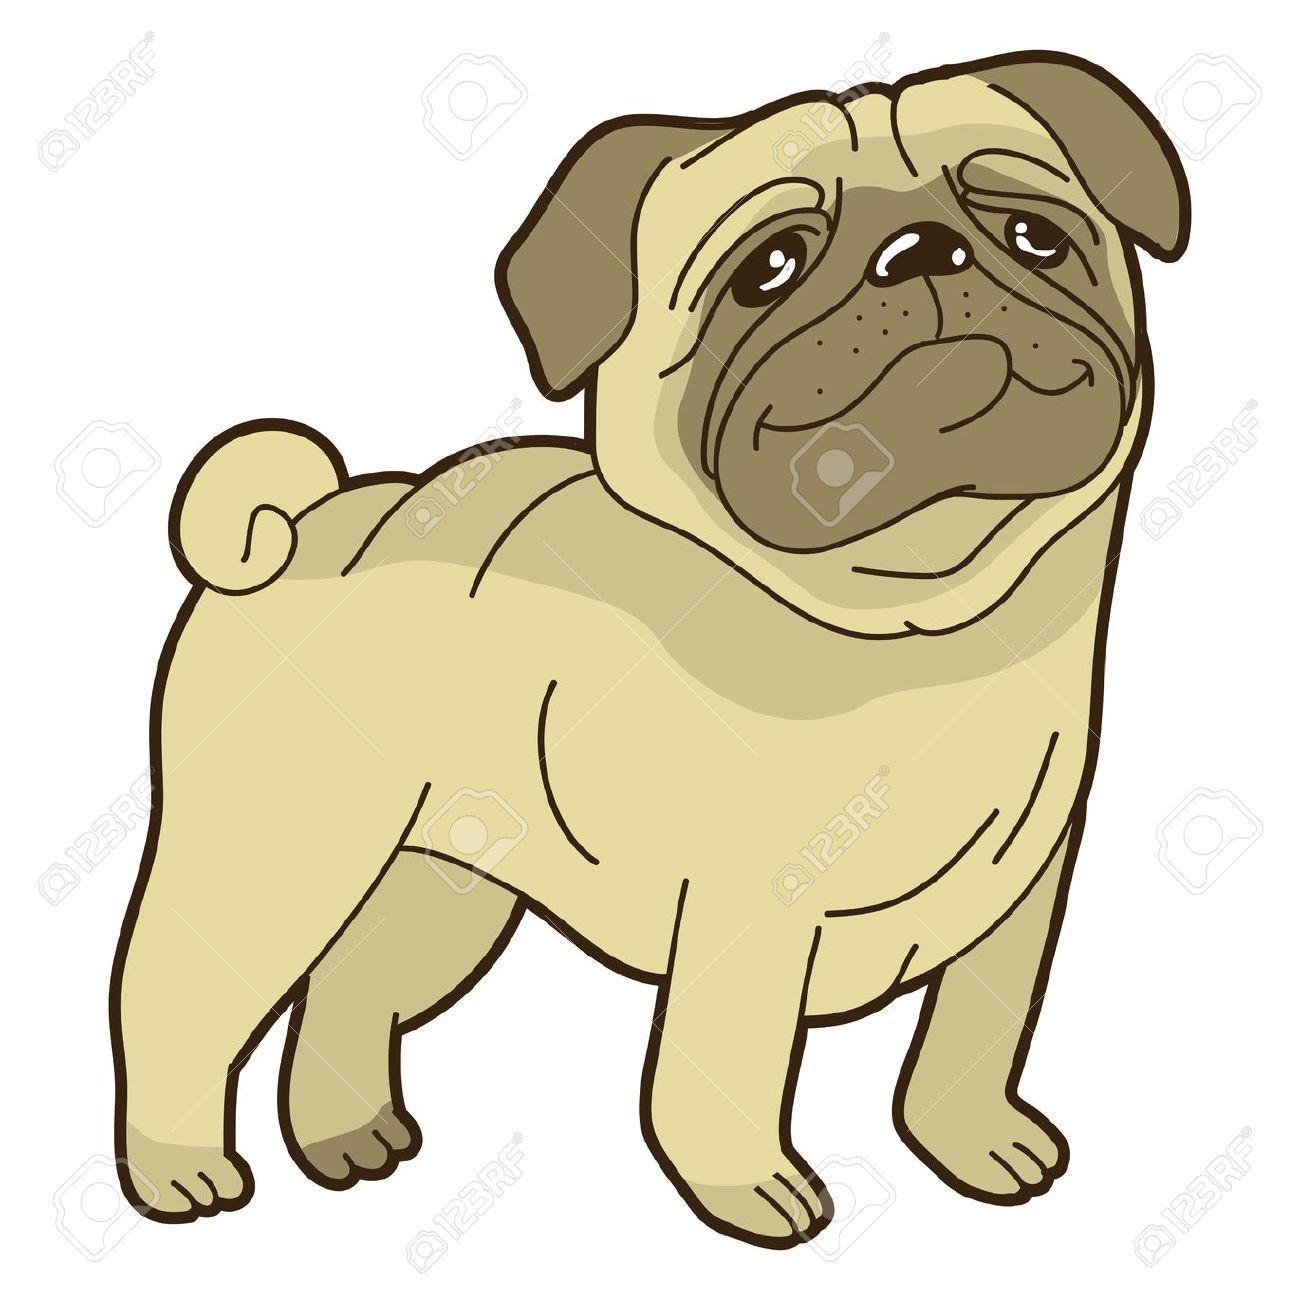 puppy stock vector illustration and royalty free puppy clipart rh pinterest com Black Puppy Clip Art Baby Puppy Clip Art